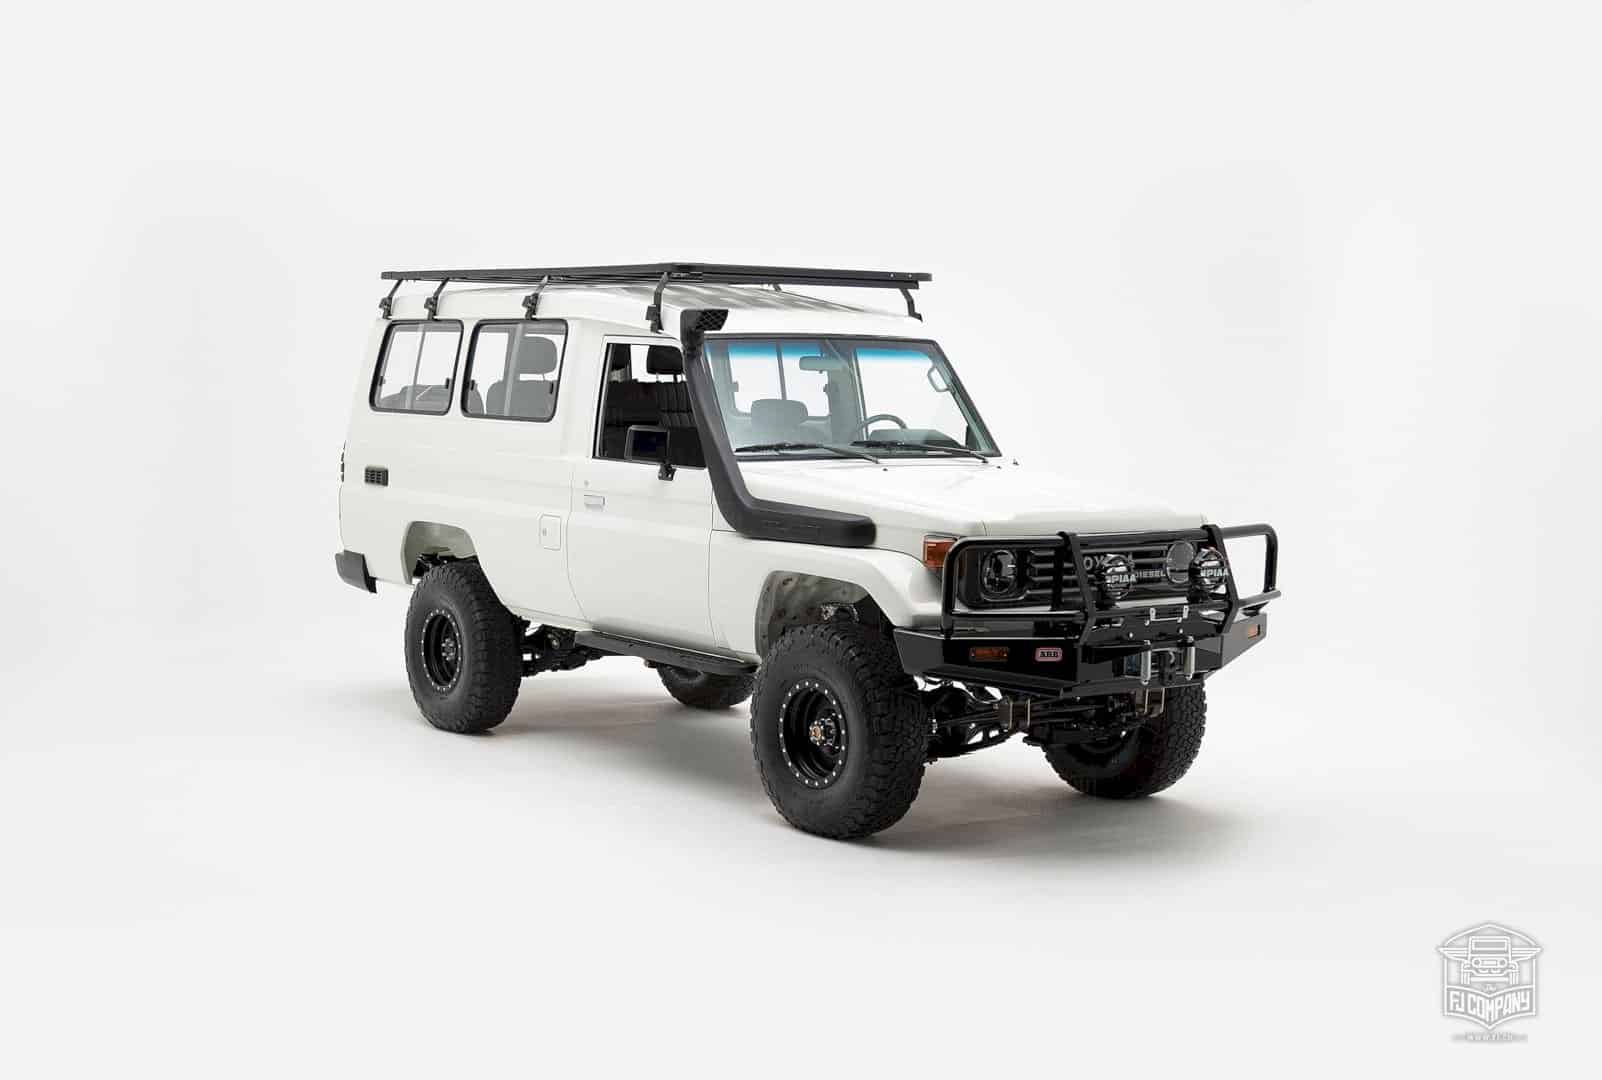 1992 Toyota Land Cruiser Hzj75 6